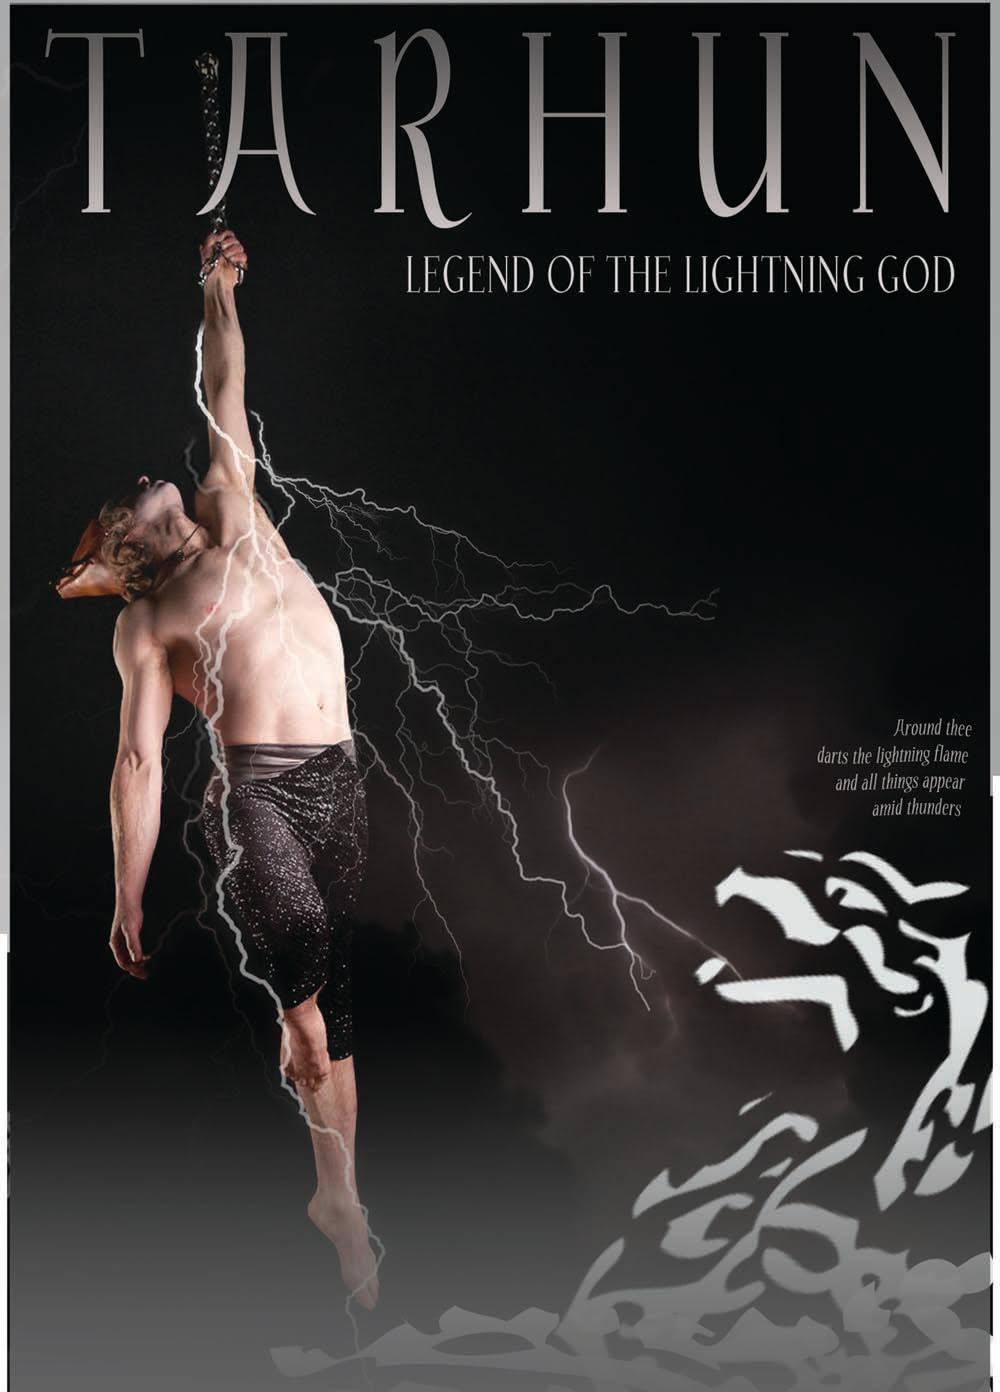 tarhun poster